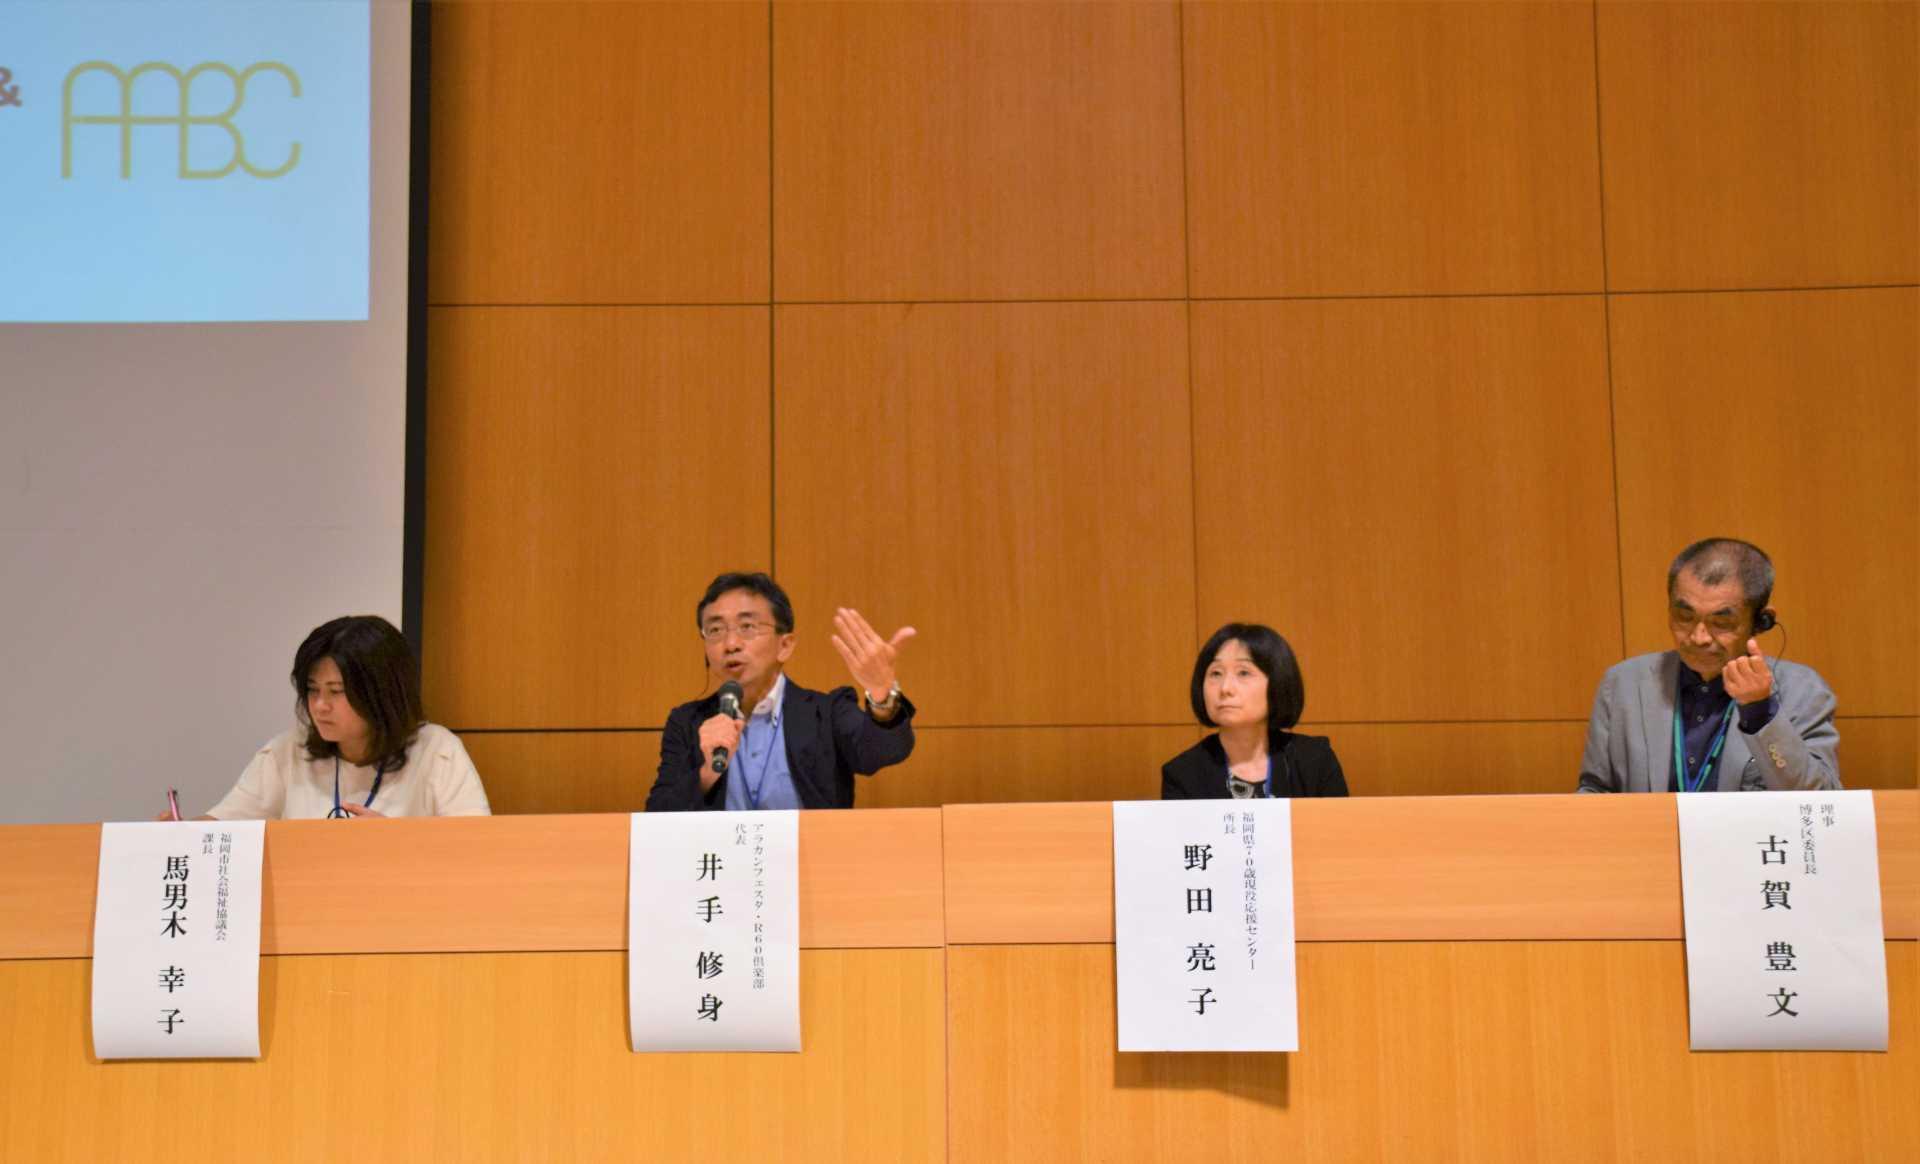 Representatives of Fukuoka Prefecture and Fukuoka City introduce various approaches at the symposium